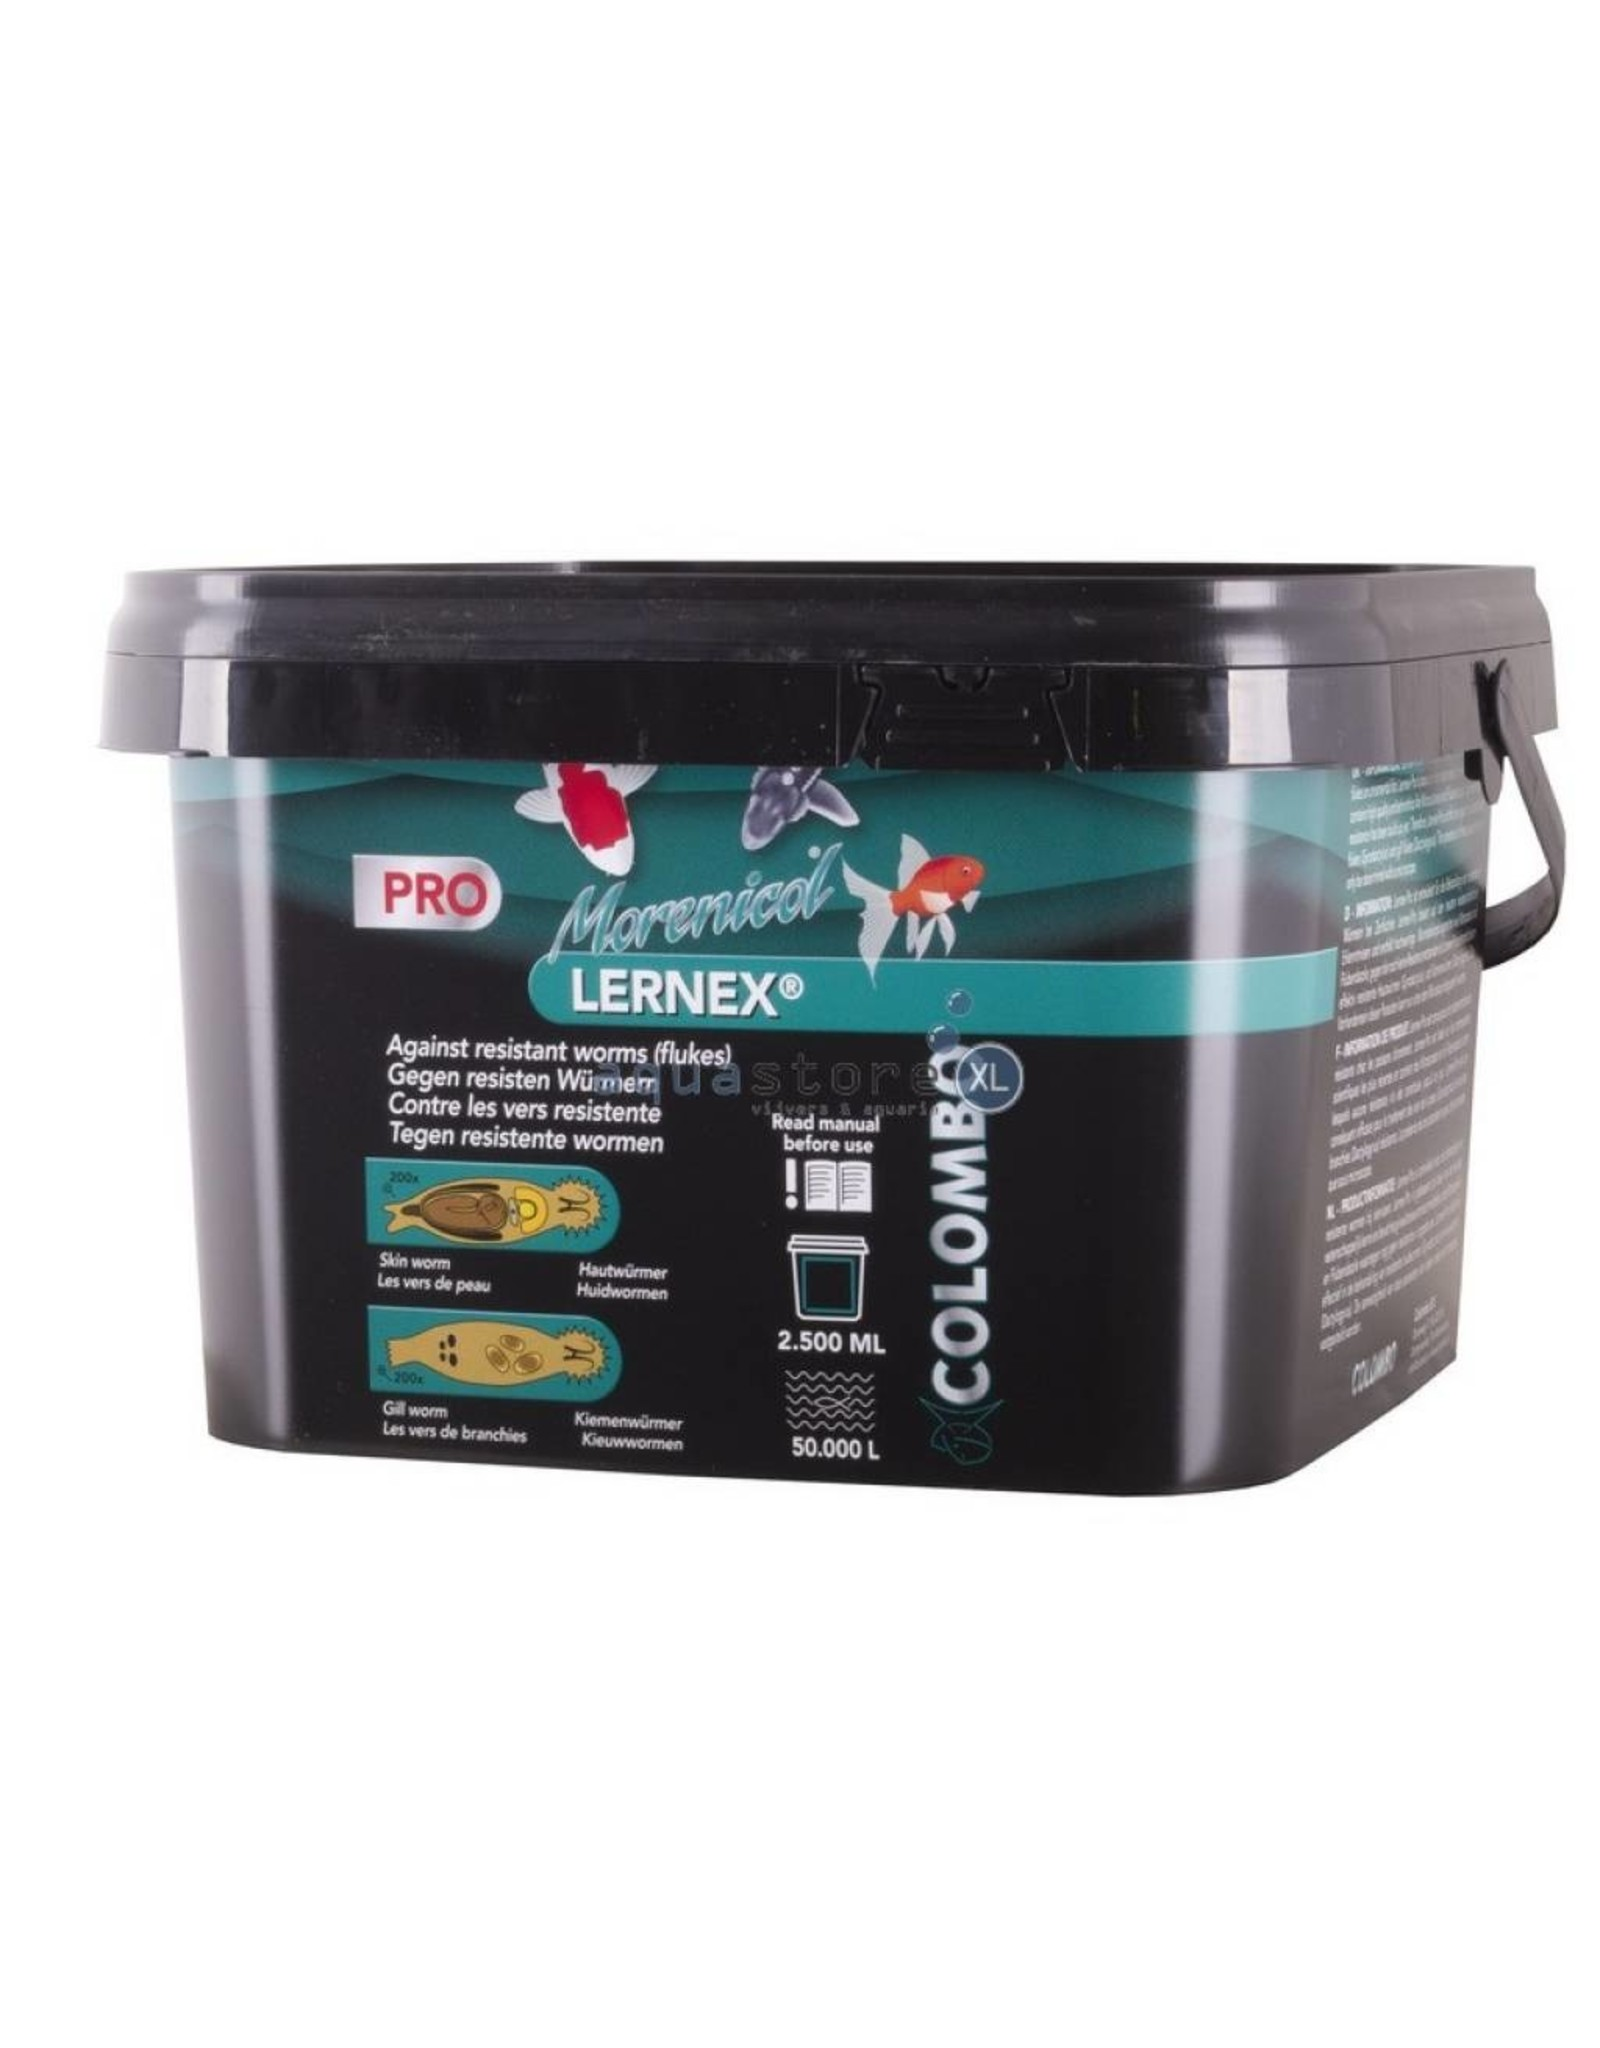 Colombo Morenicol Lernex Pro mit Praziquantel & Nitroscanate (gegen Resistenz)